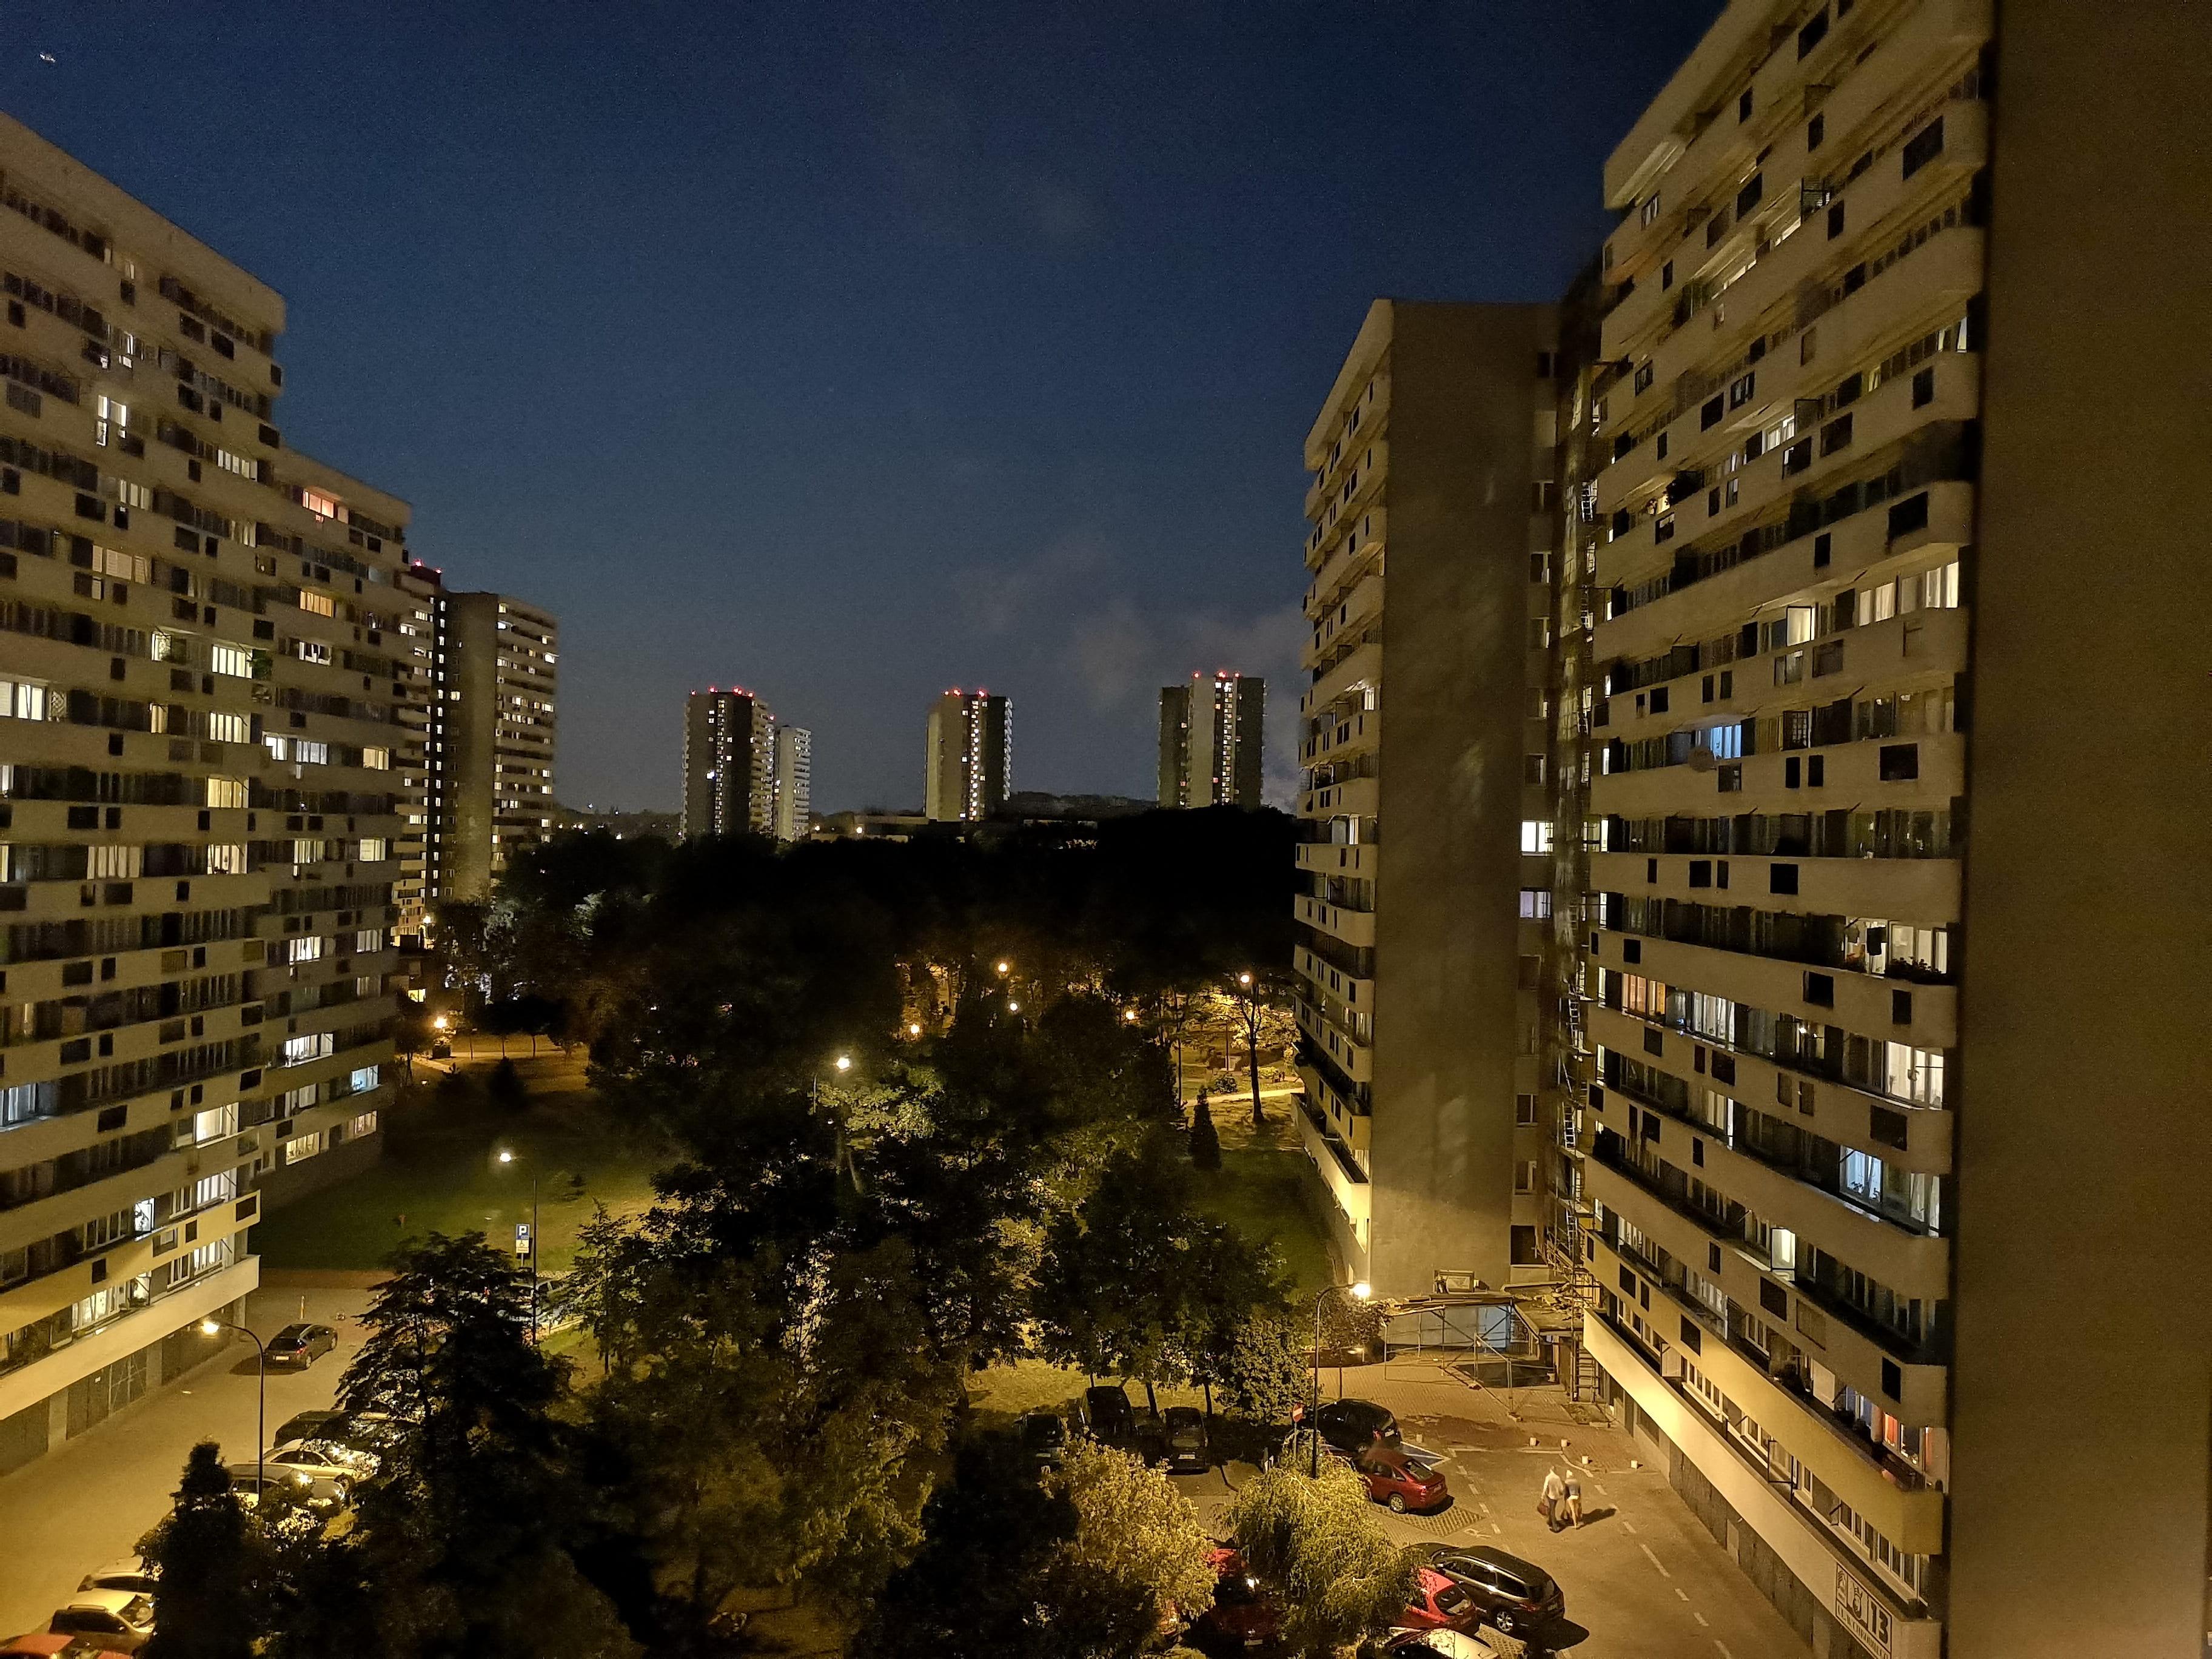 Zdjęcia nocne - Huawei P20 Pro